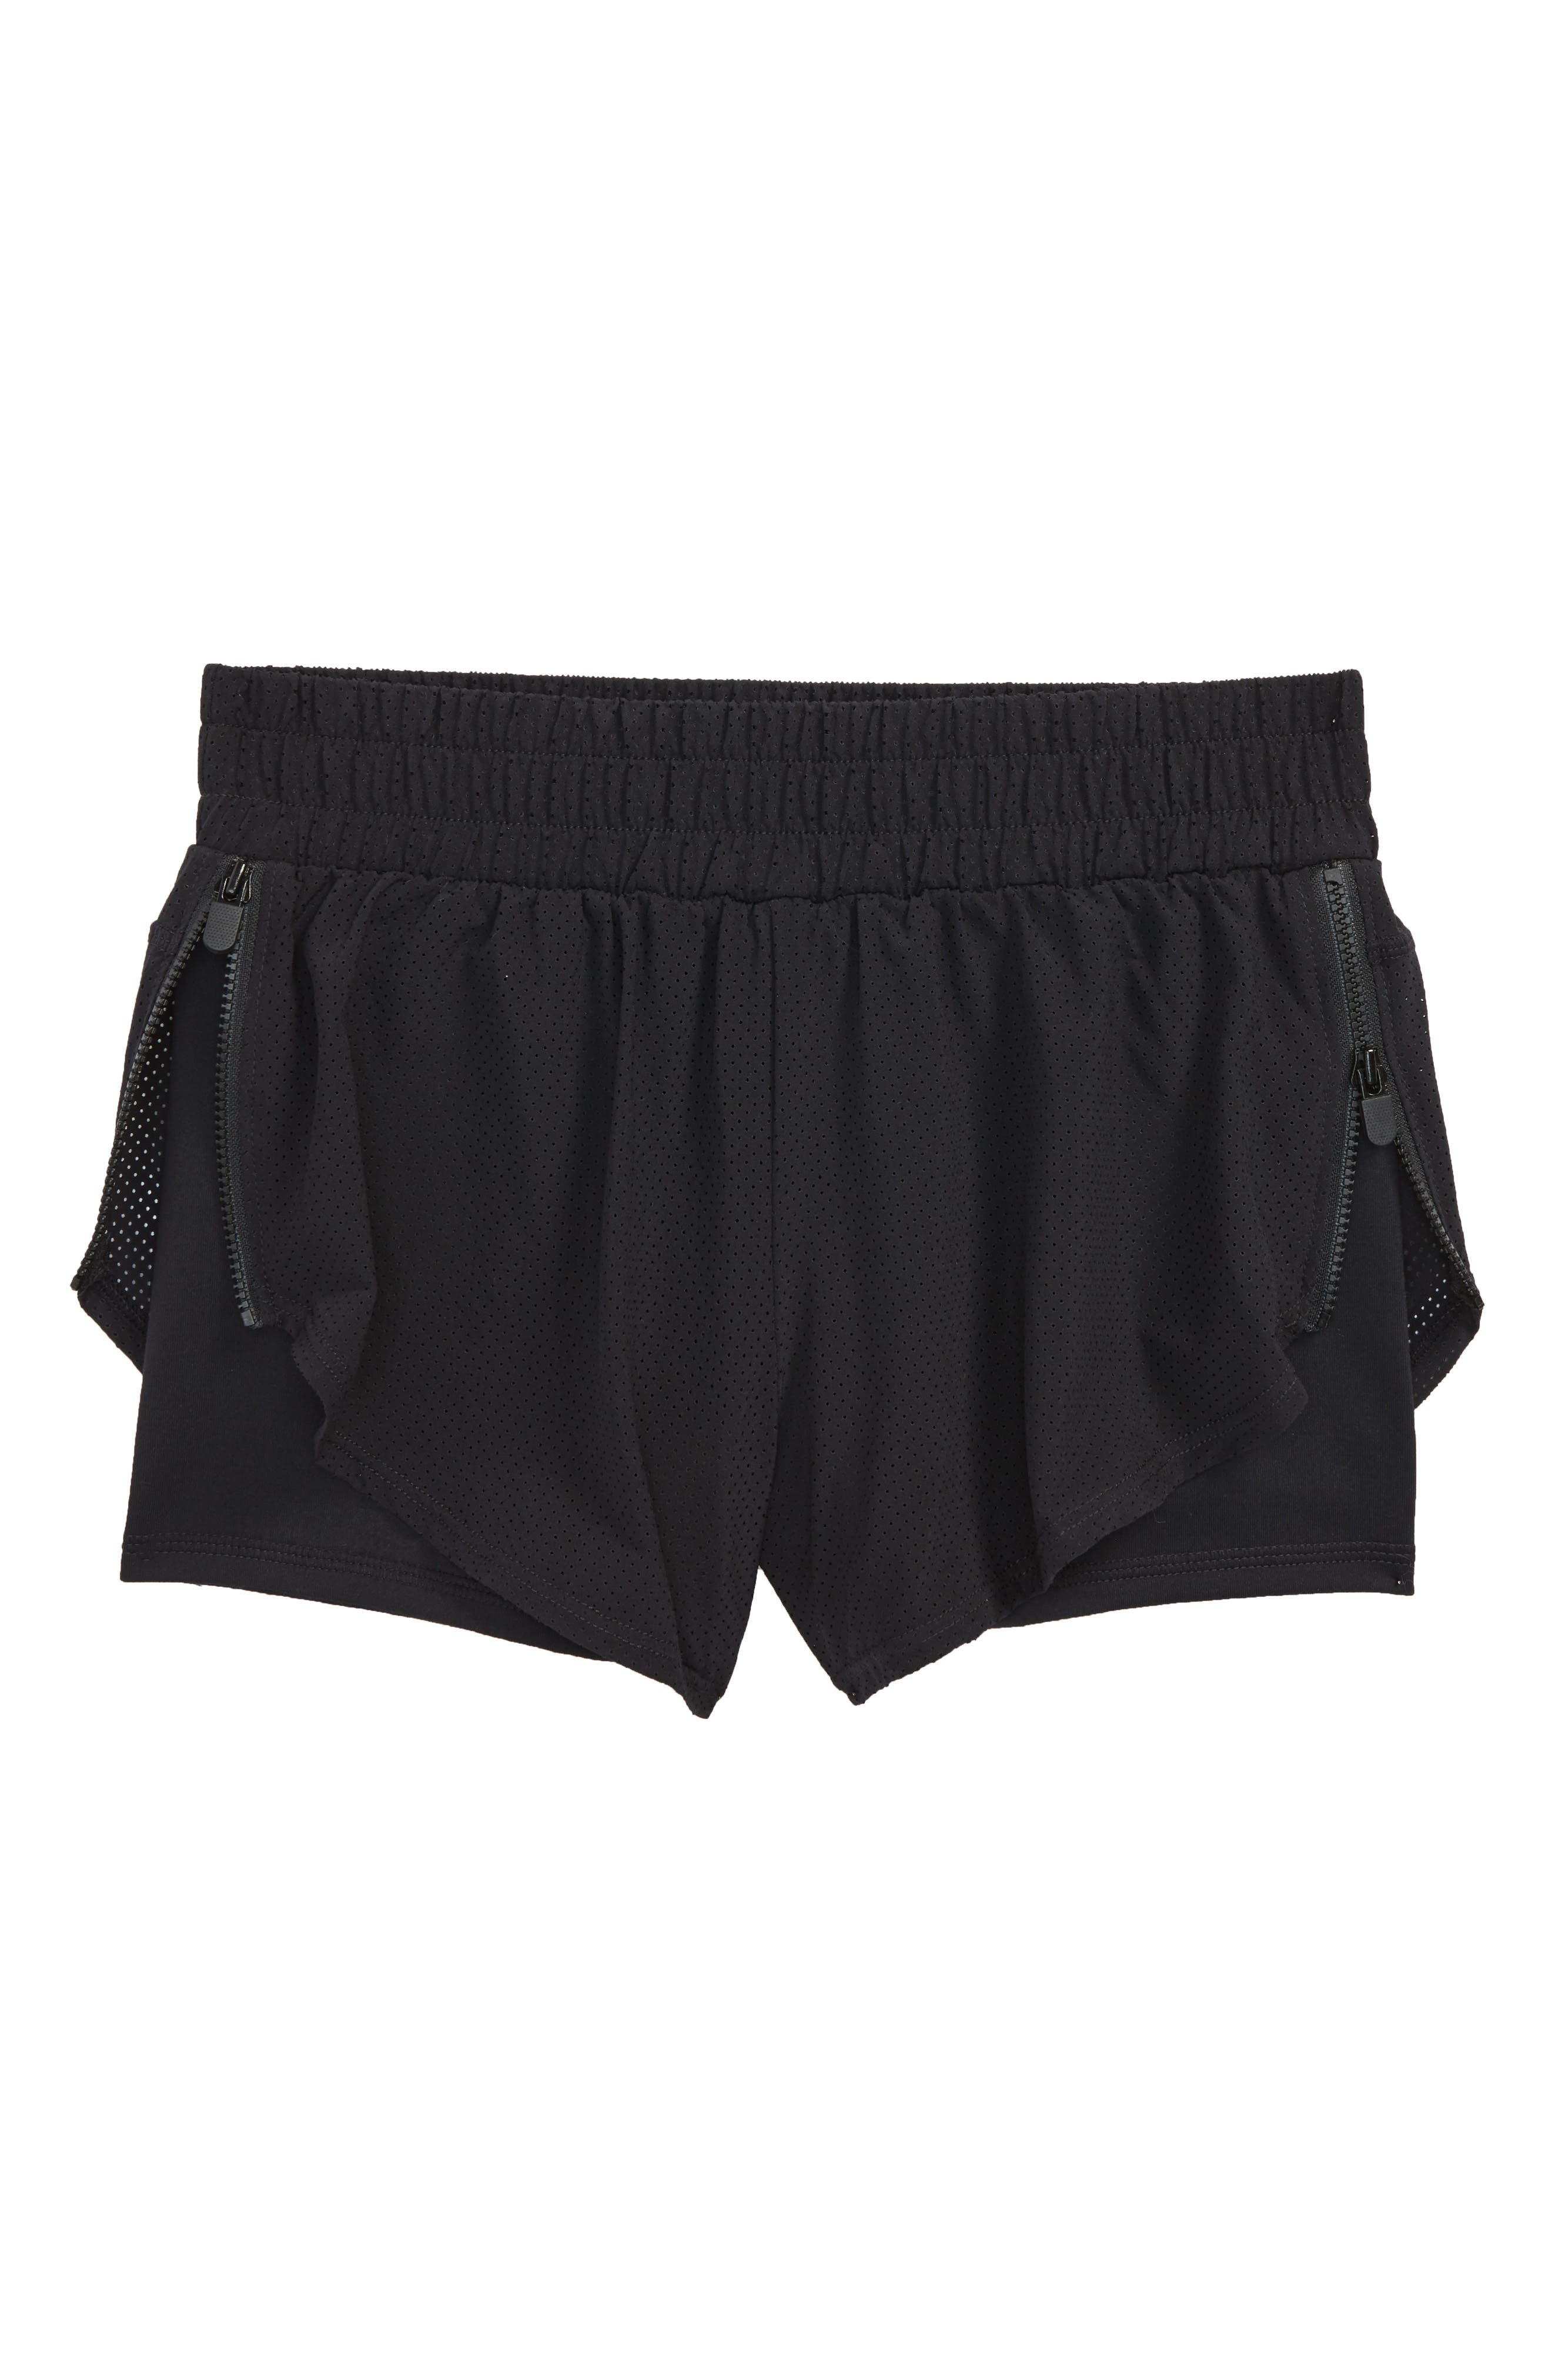 Double Layer Shorts,                         Main,                         color, Black